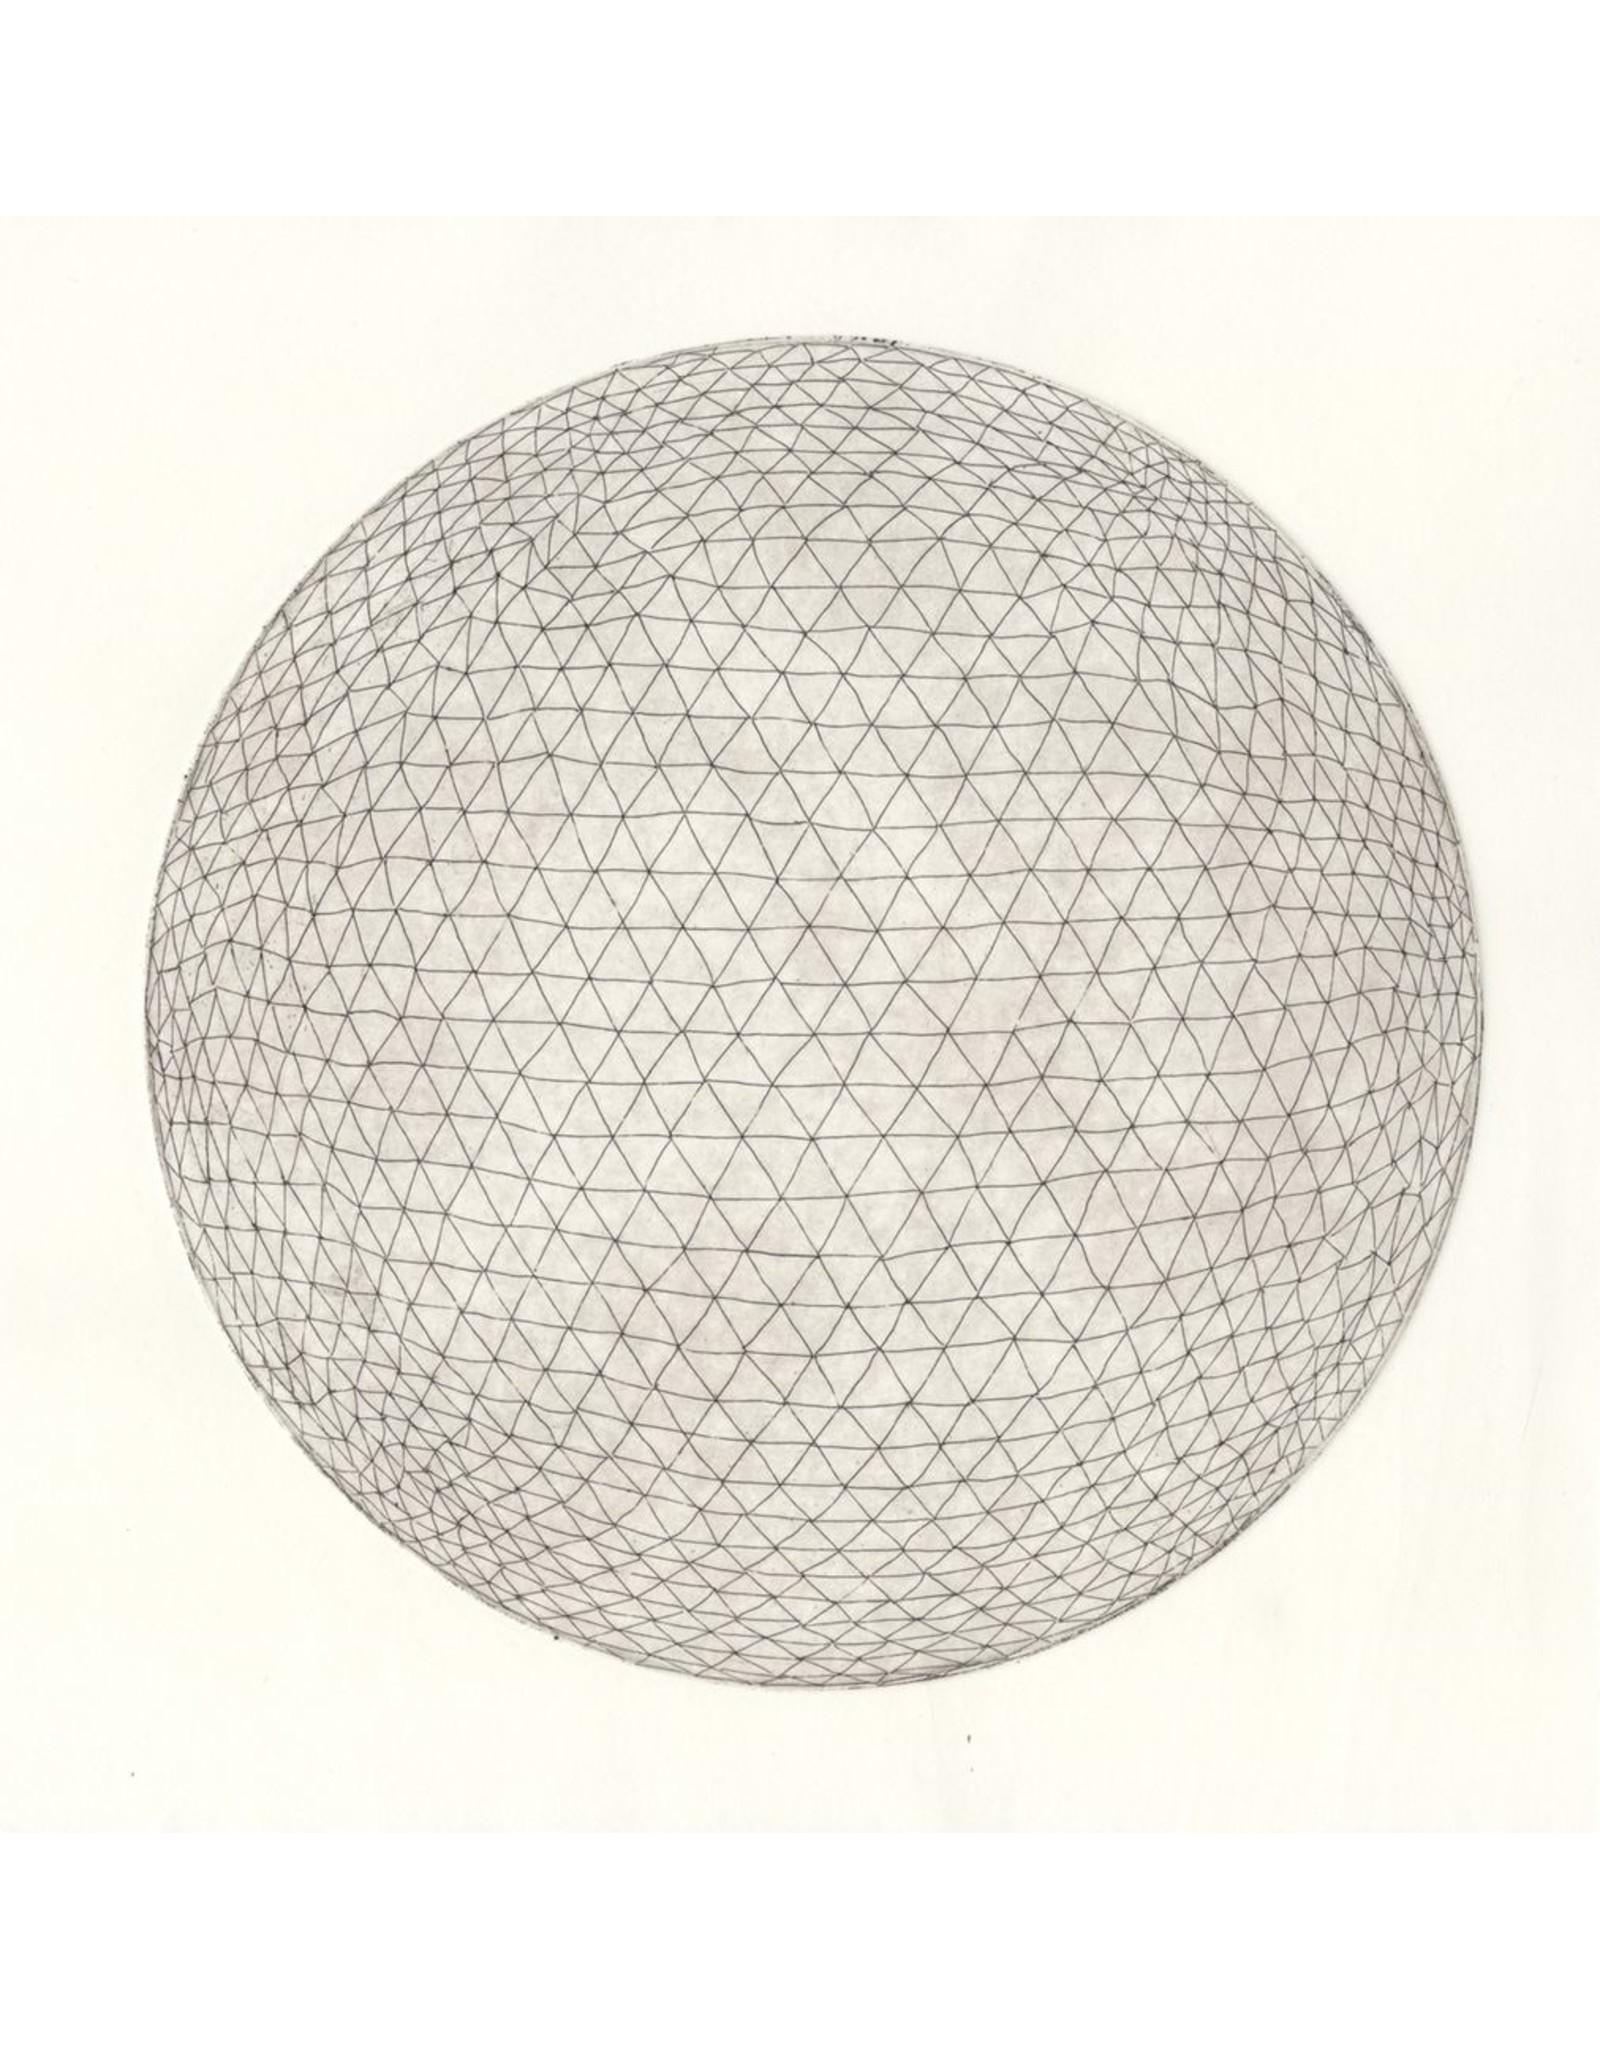 Josephson-Laidlaw, Erin Untitled (small biosphere, black), Erin Josephson-Laidlaw